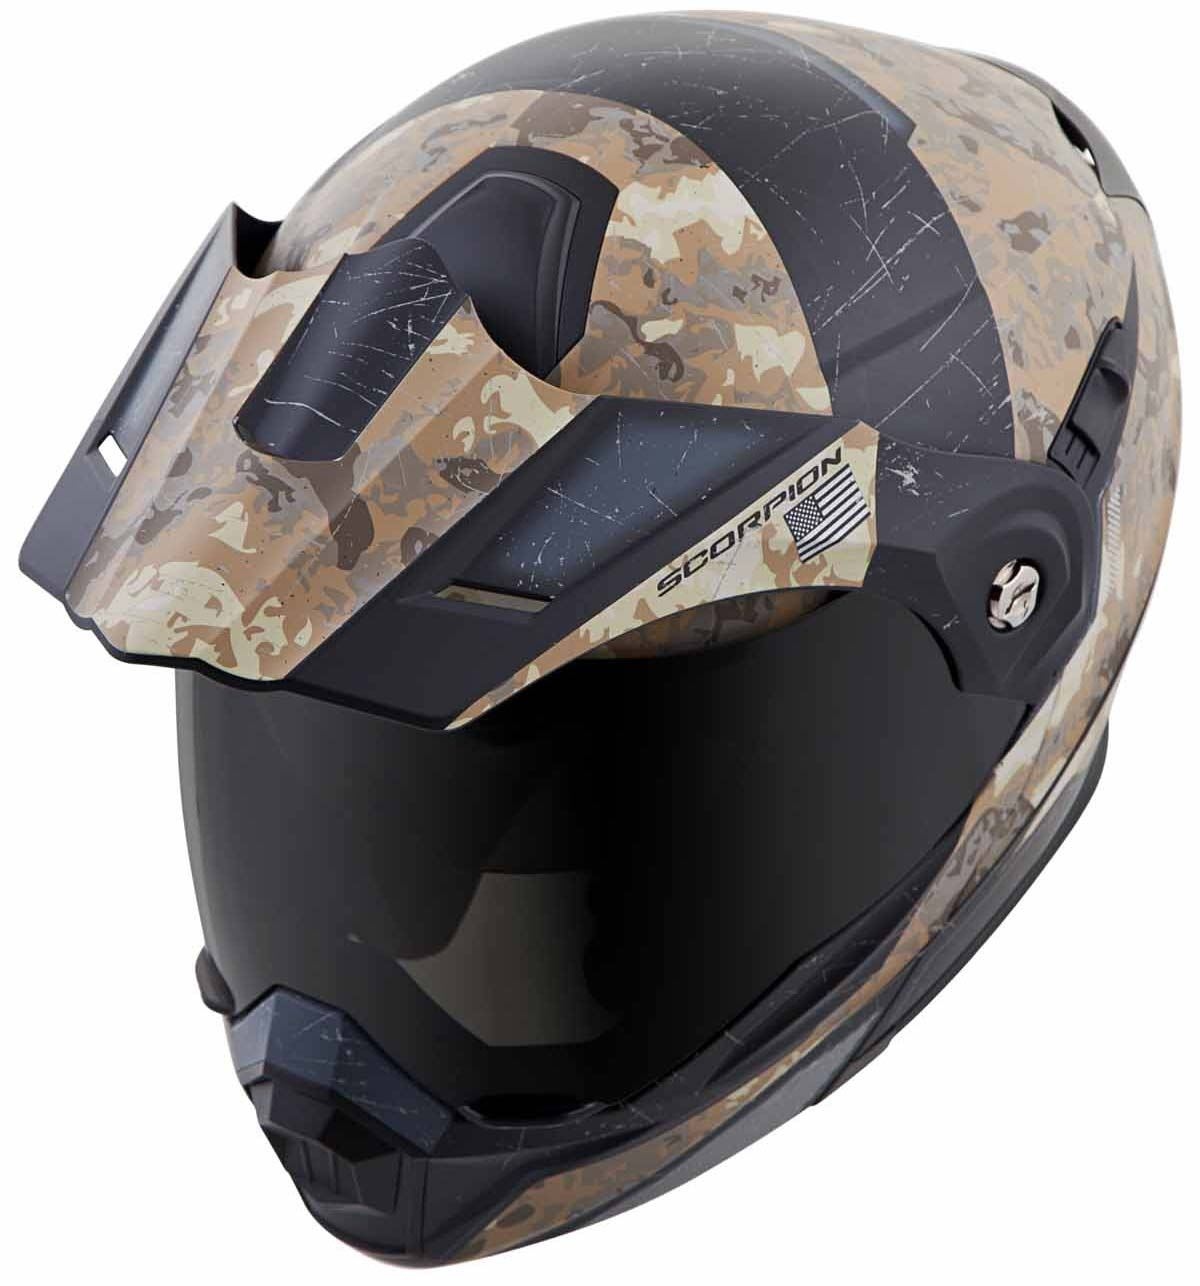 Scorpion-EXO-AT950-Helmet-Flip-Up-Modular-Dual-Sport-Adventure-ADV-DOT-XS-3XL miniature 59